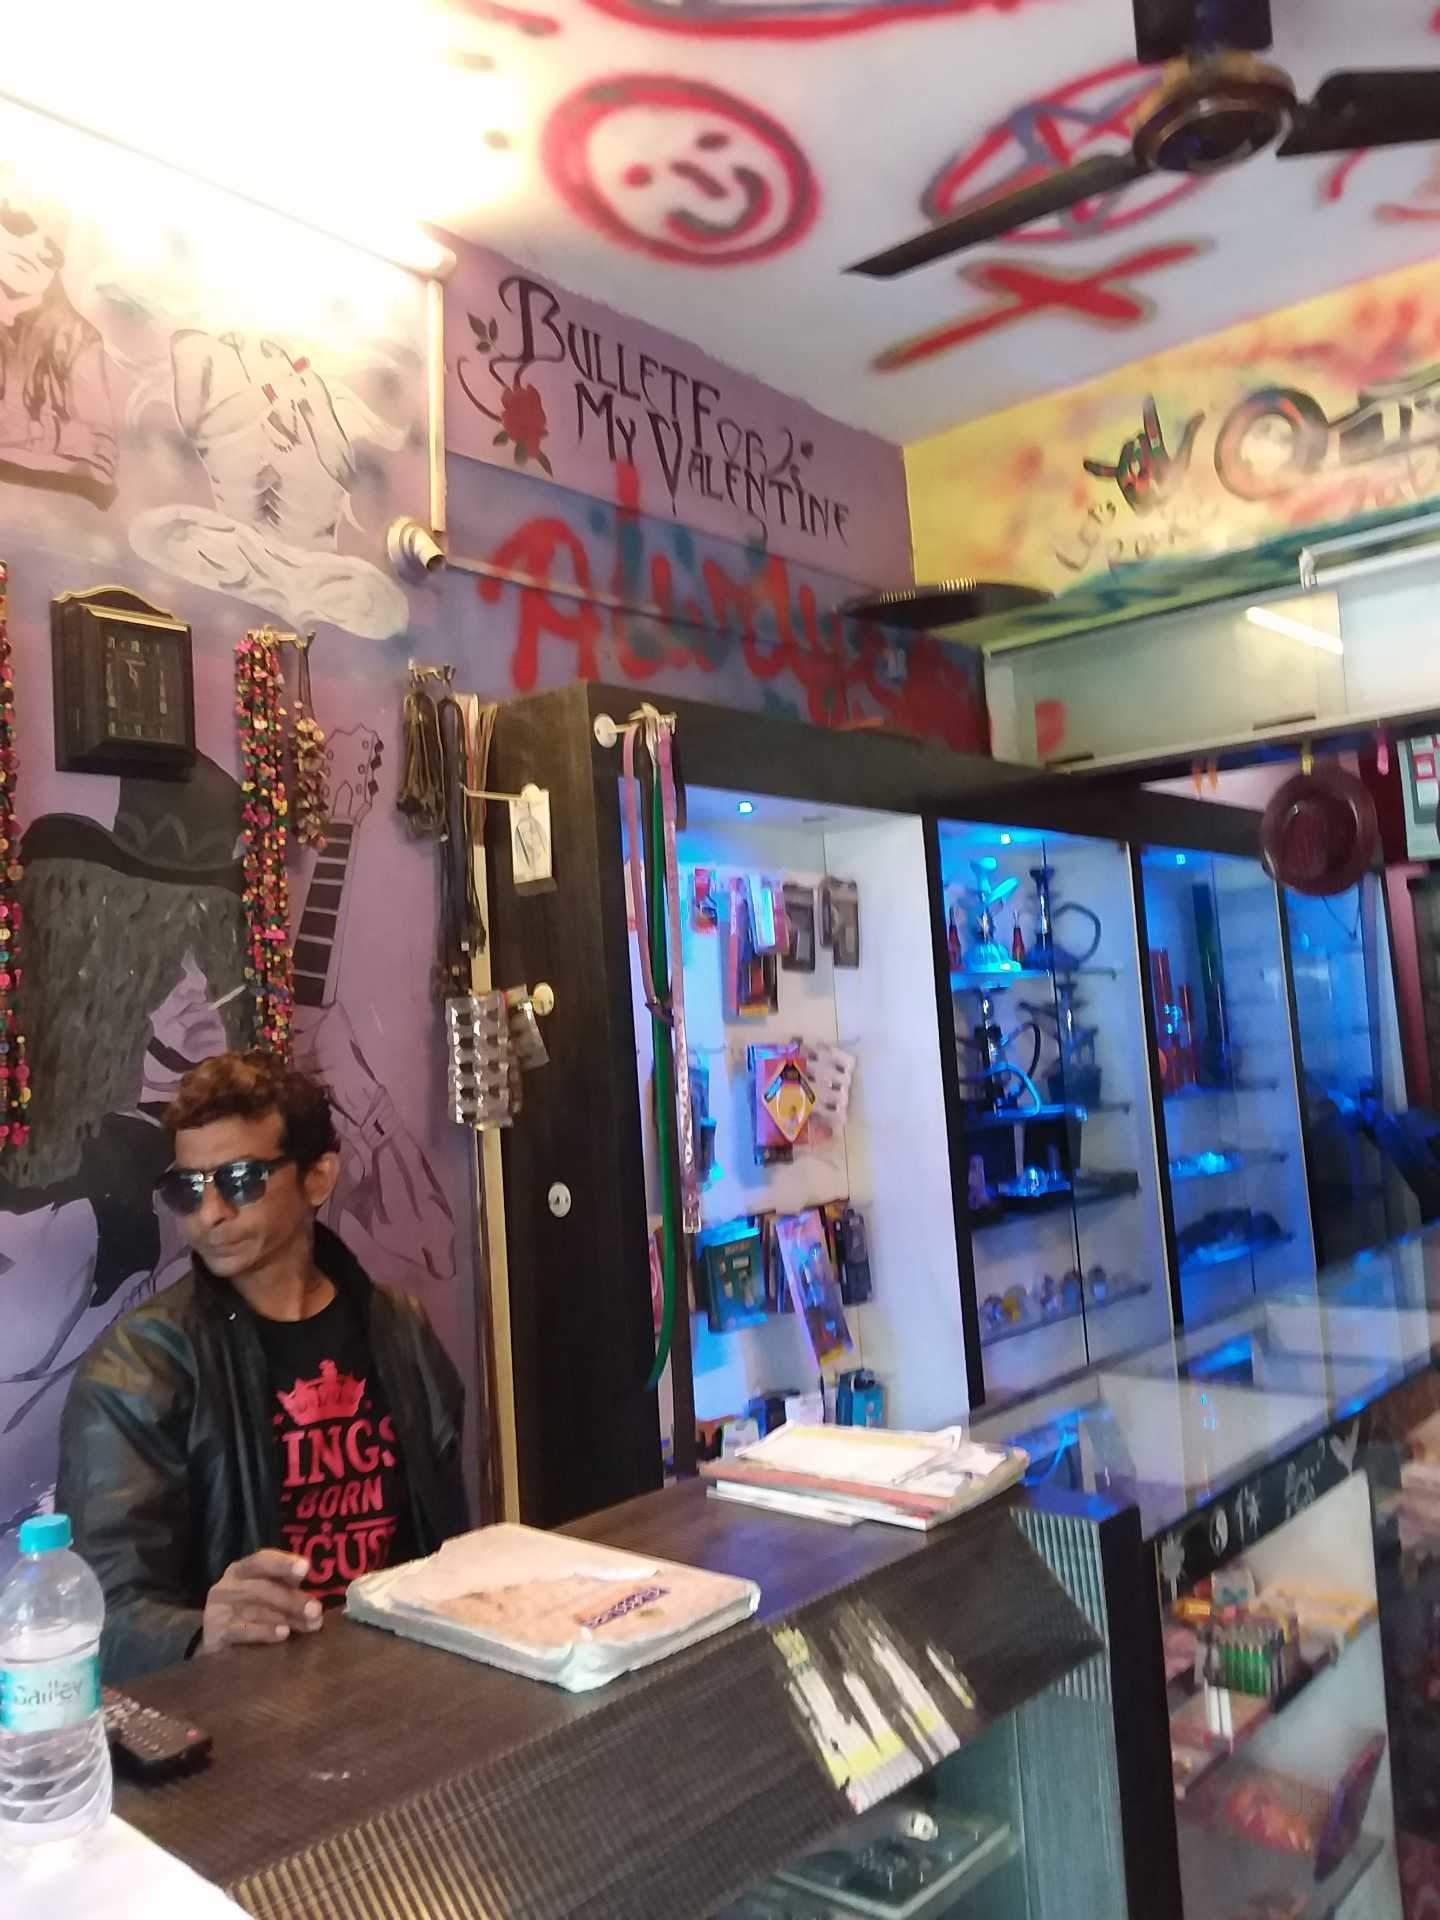 Top Pen Electronic Hookah Dealers in Bangalore - Justdial